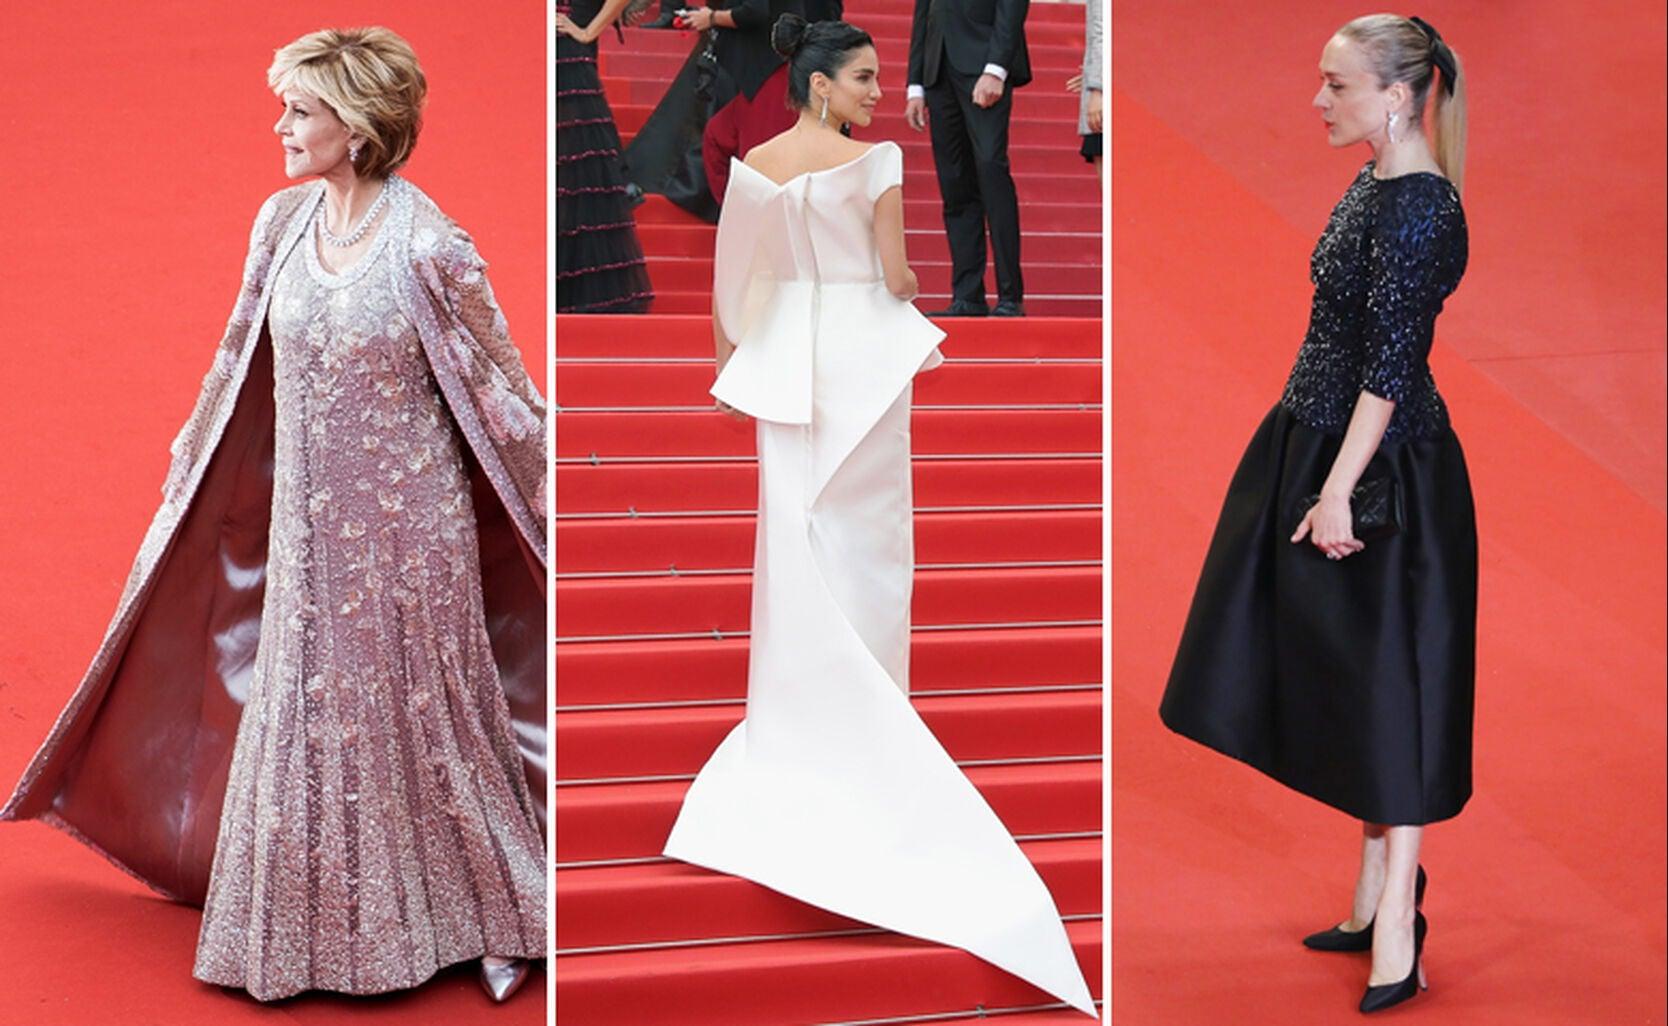 Jane Fonda, Jessica Kahawaty and Chloë Sevigny